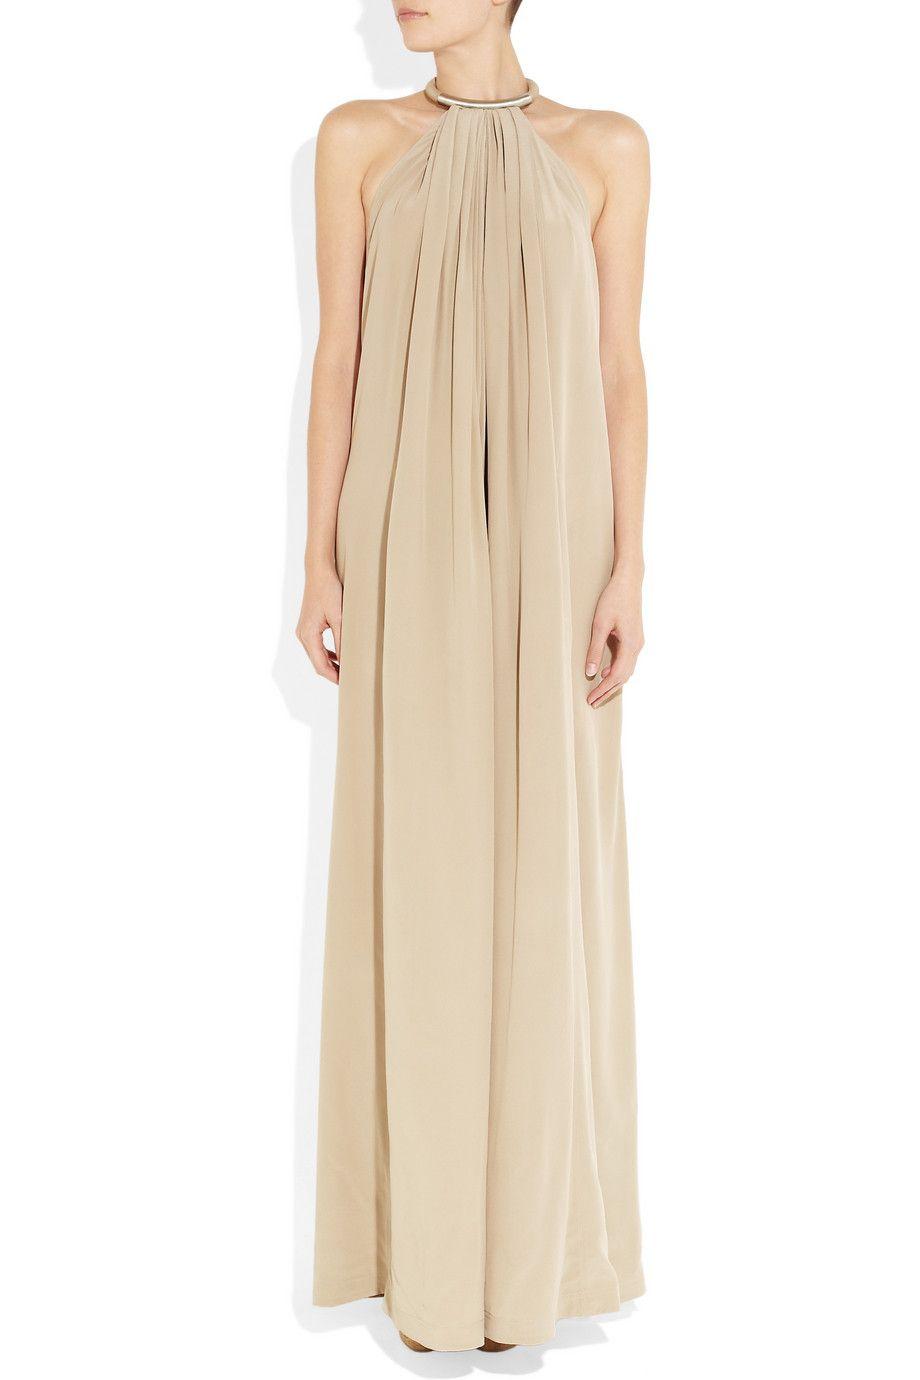 Kaufmanfranco nude dress